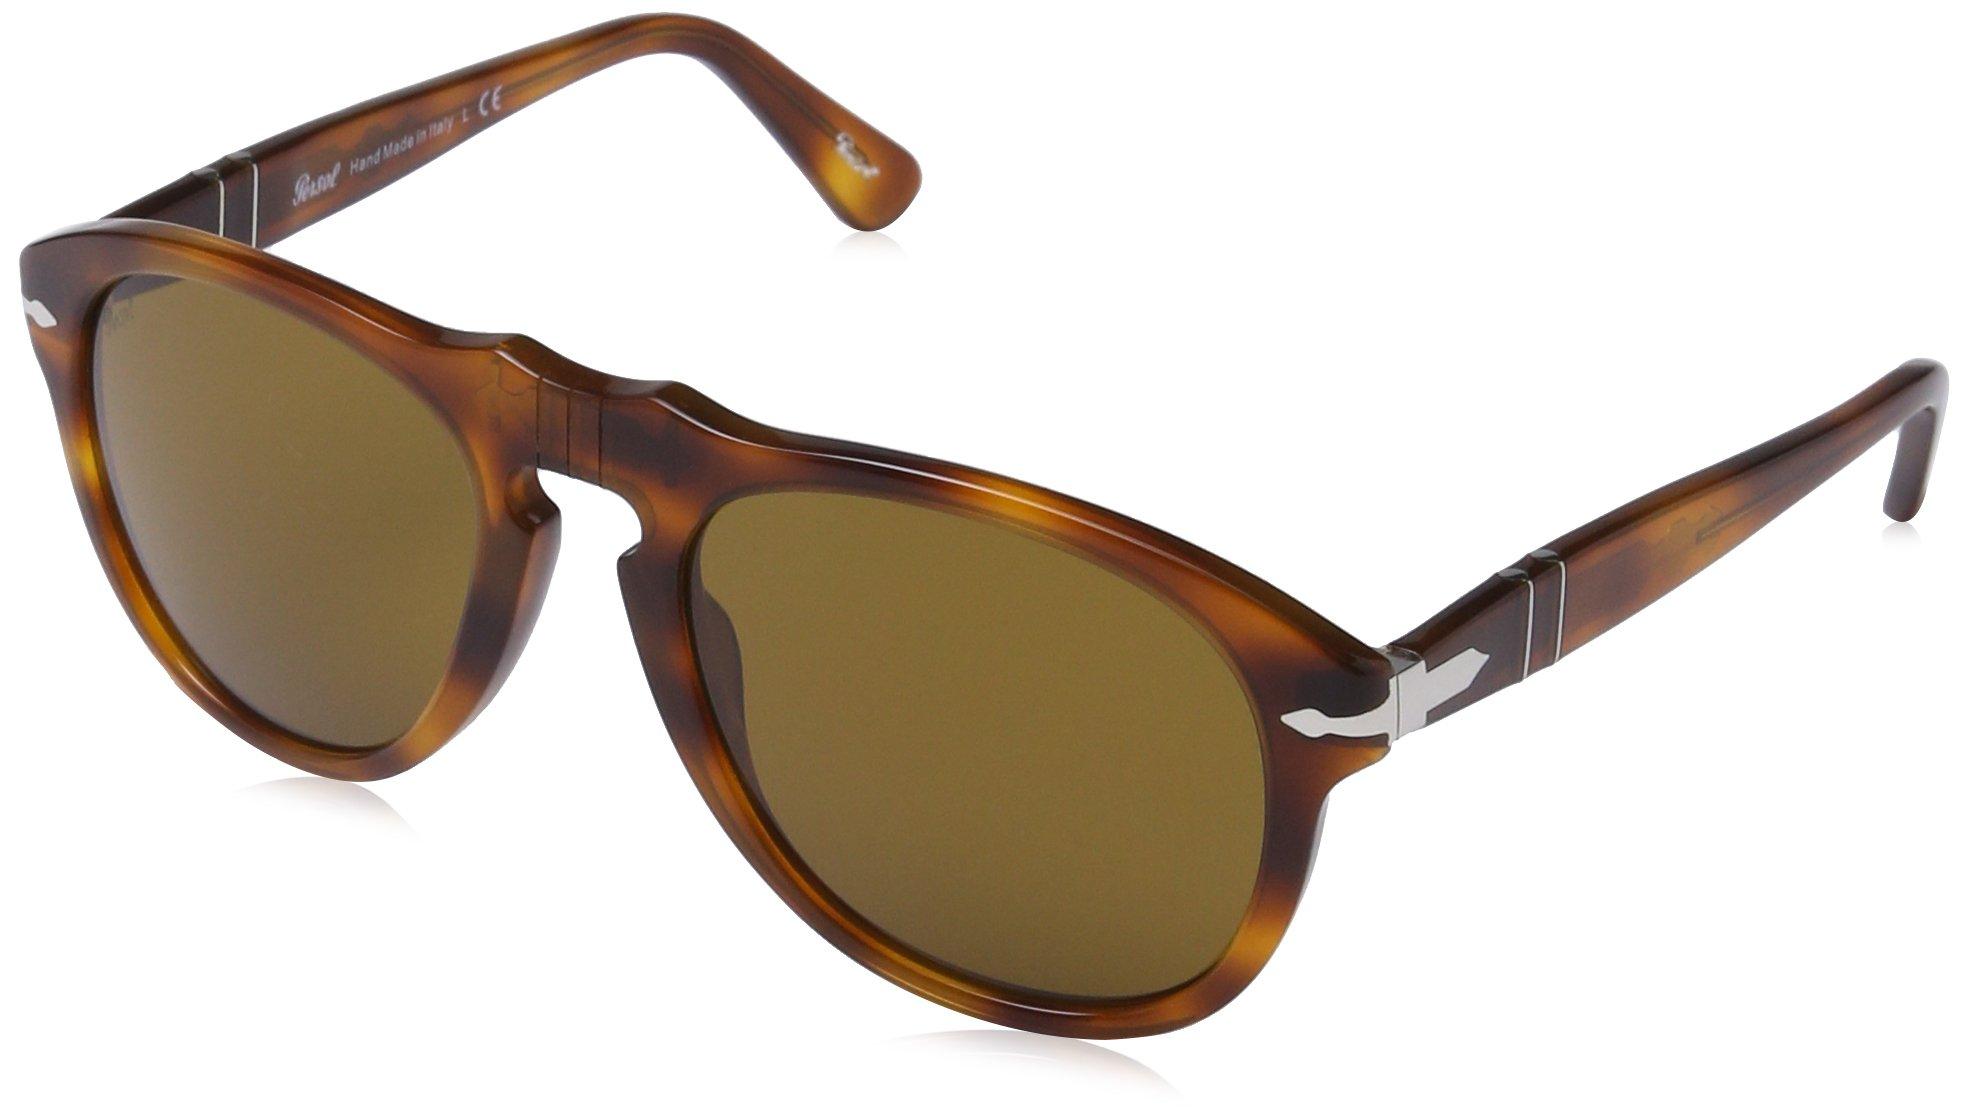 Persol Sunglasses PO0649 Light Havana